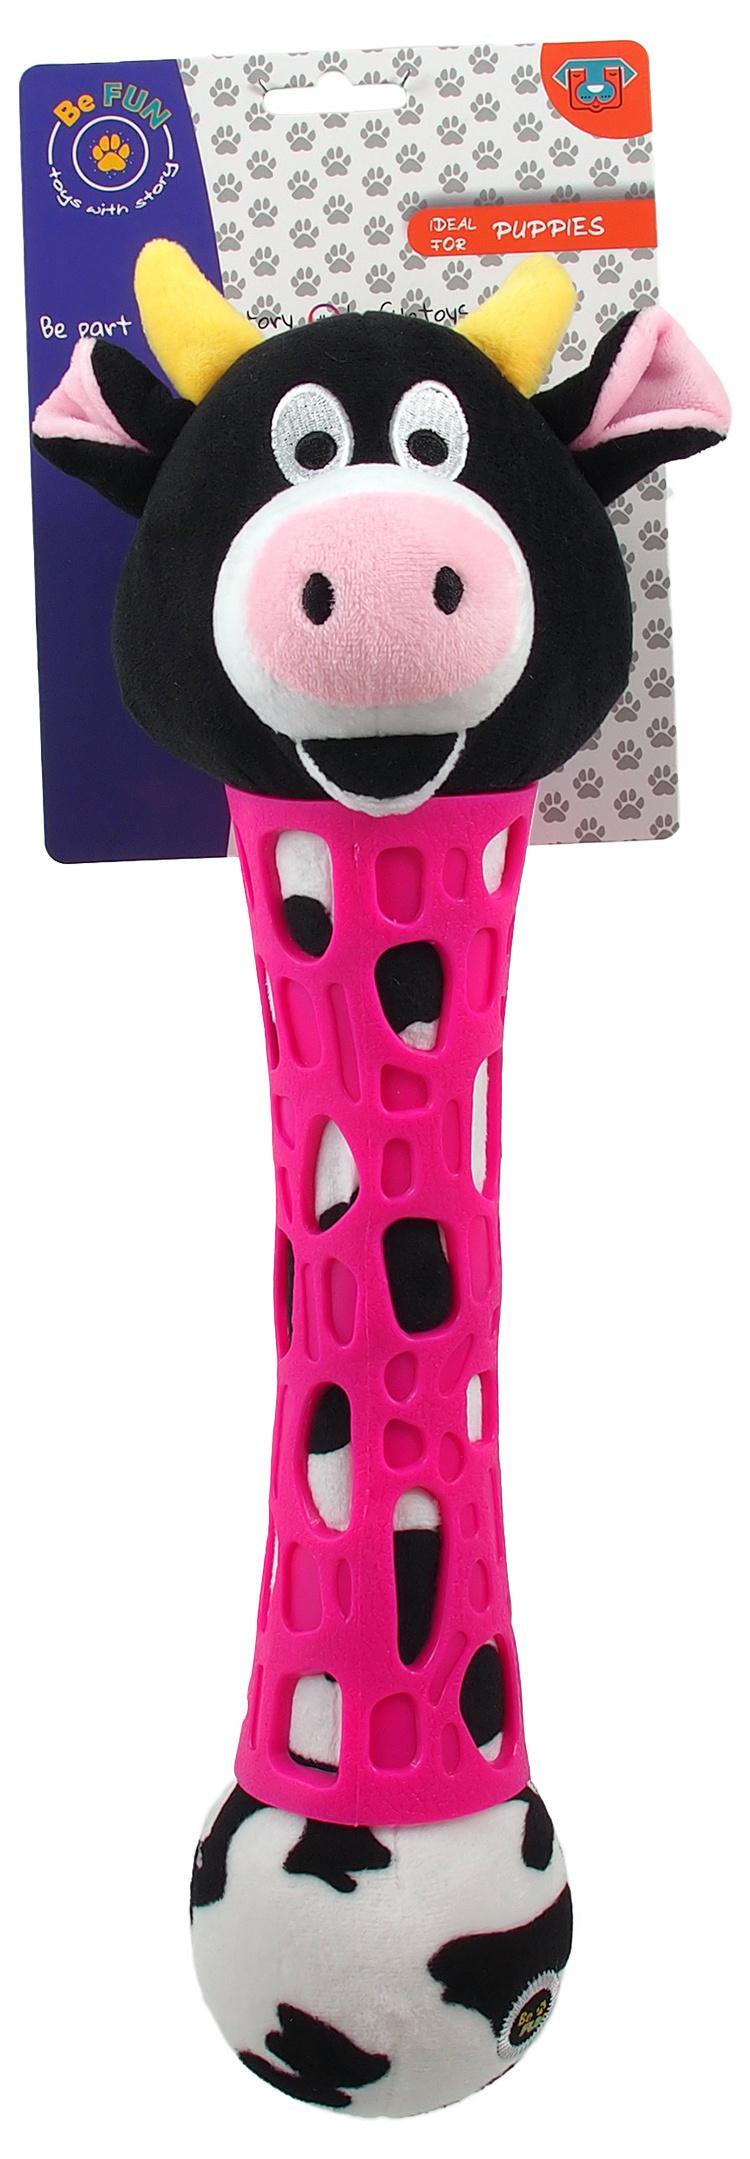 Игрушка для собак - Be Fun TPR toy + Plush Cow, 39 см